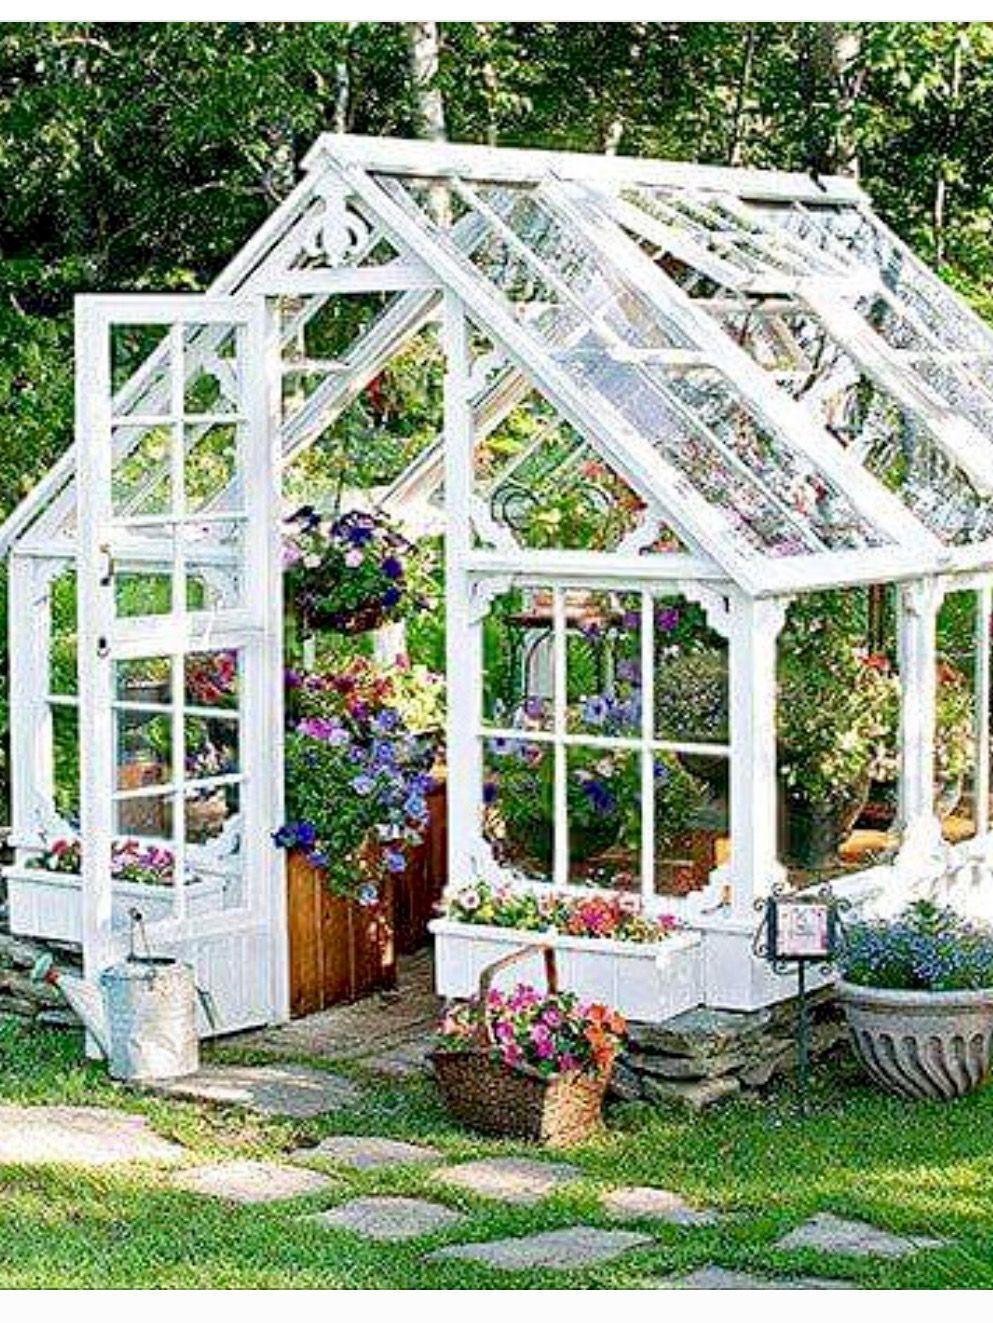 Pin by Saliha S alp on Balkon bah e Pinterest – Garden Greenhouse Plans